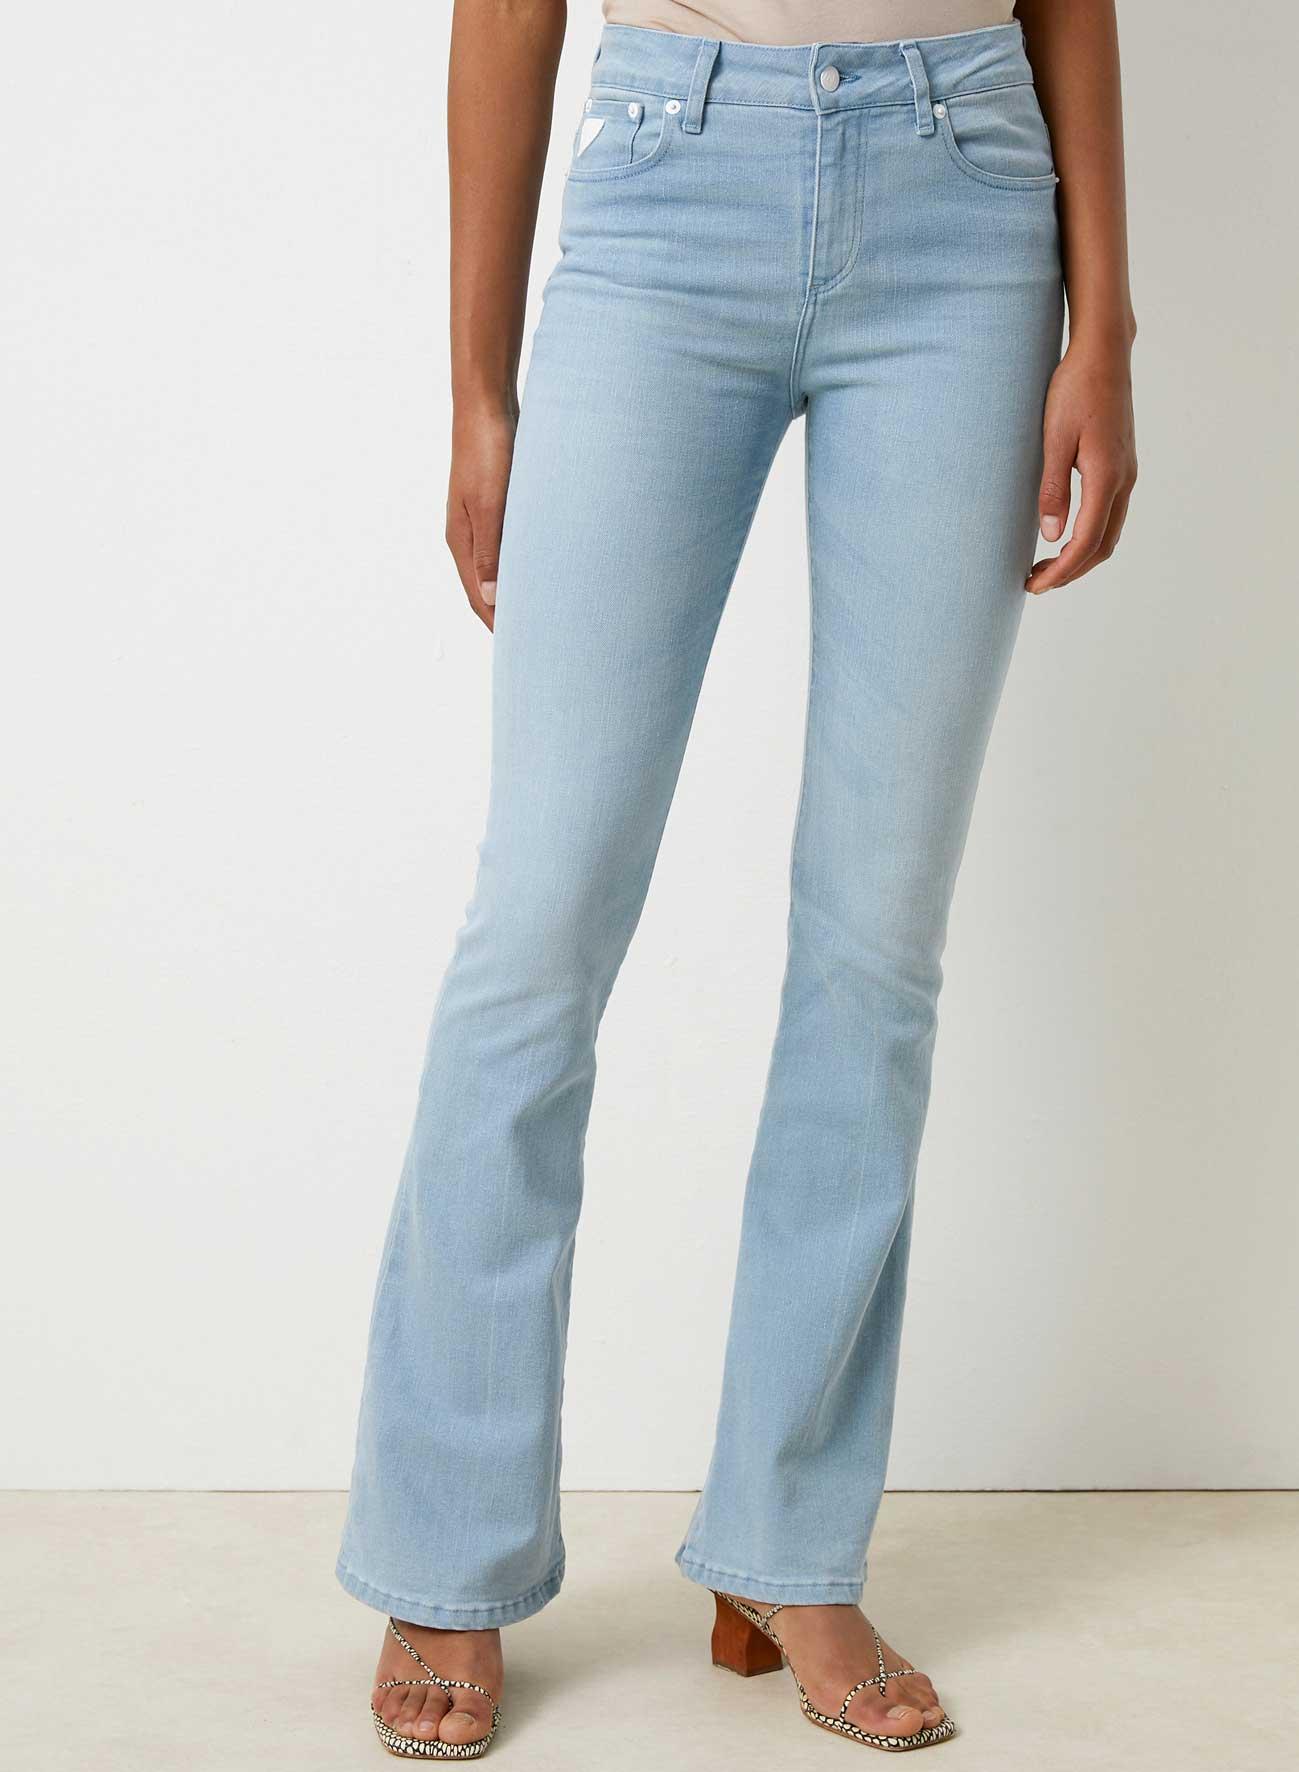 LOIS-Jeans-Raval-Stone-Bleach-2007-6420-32